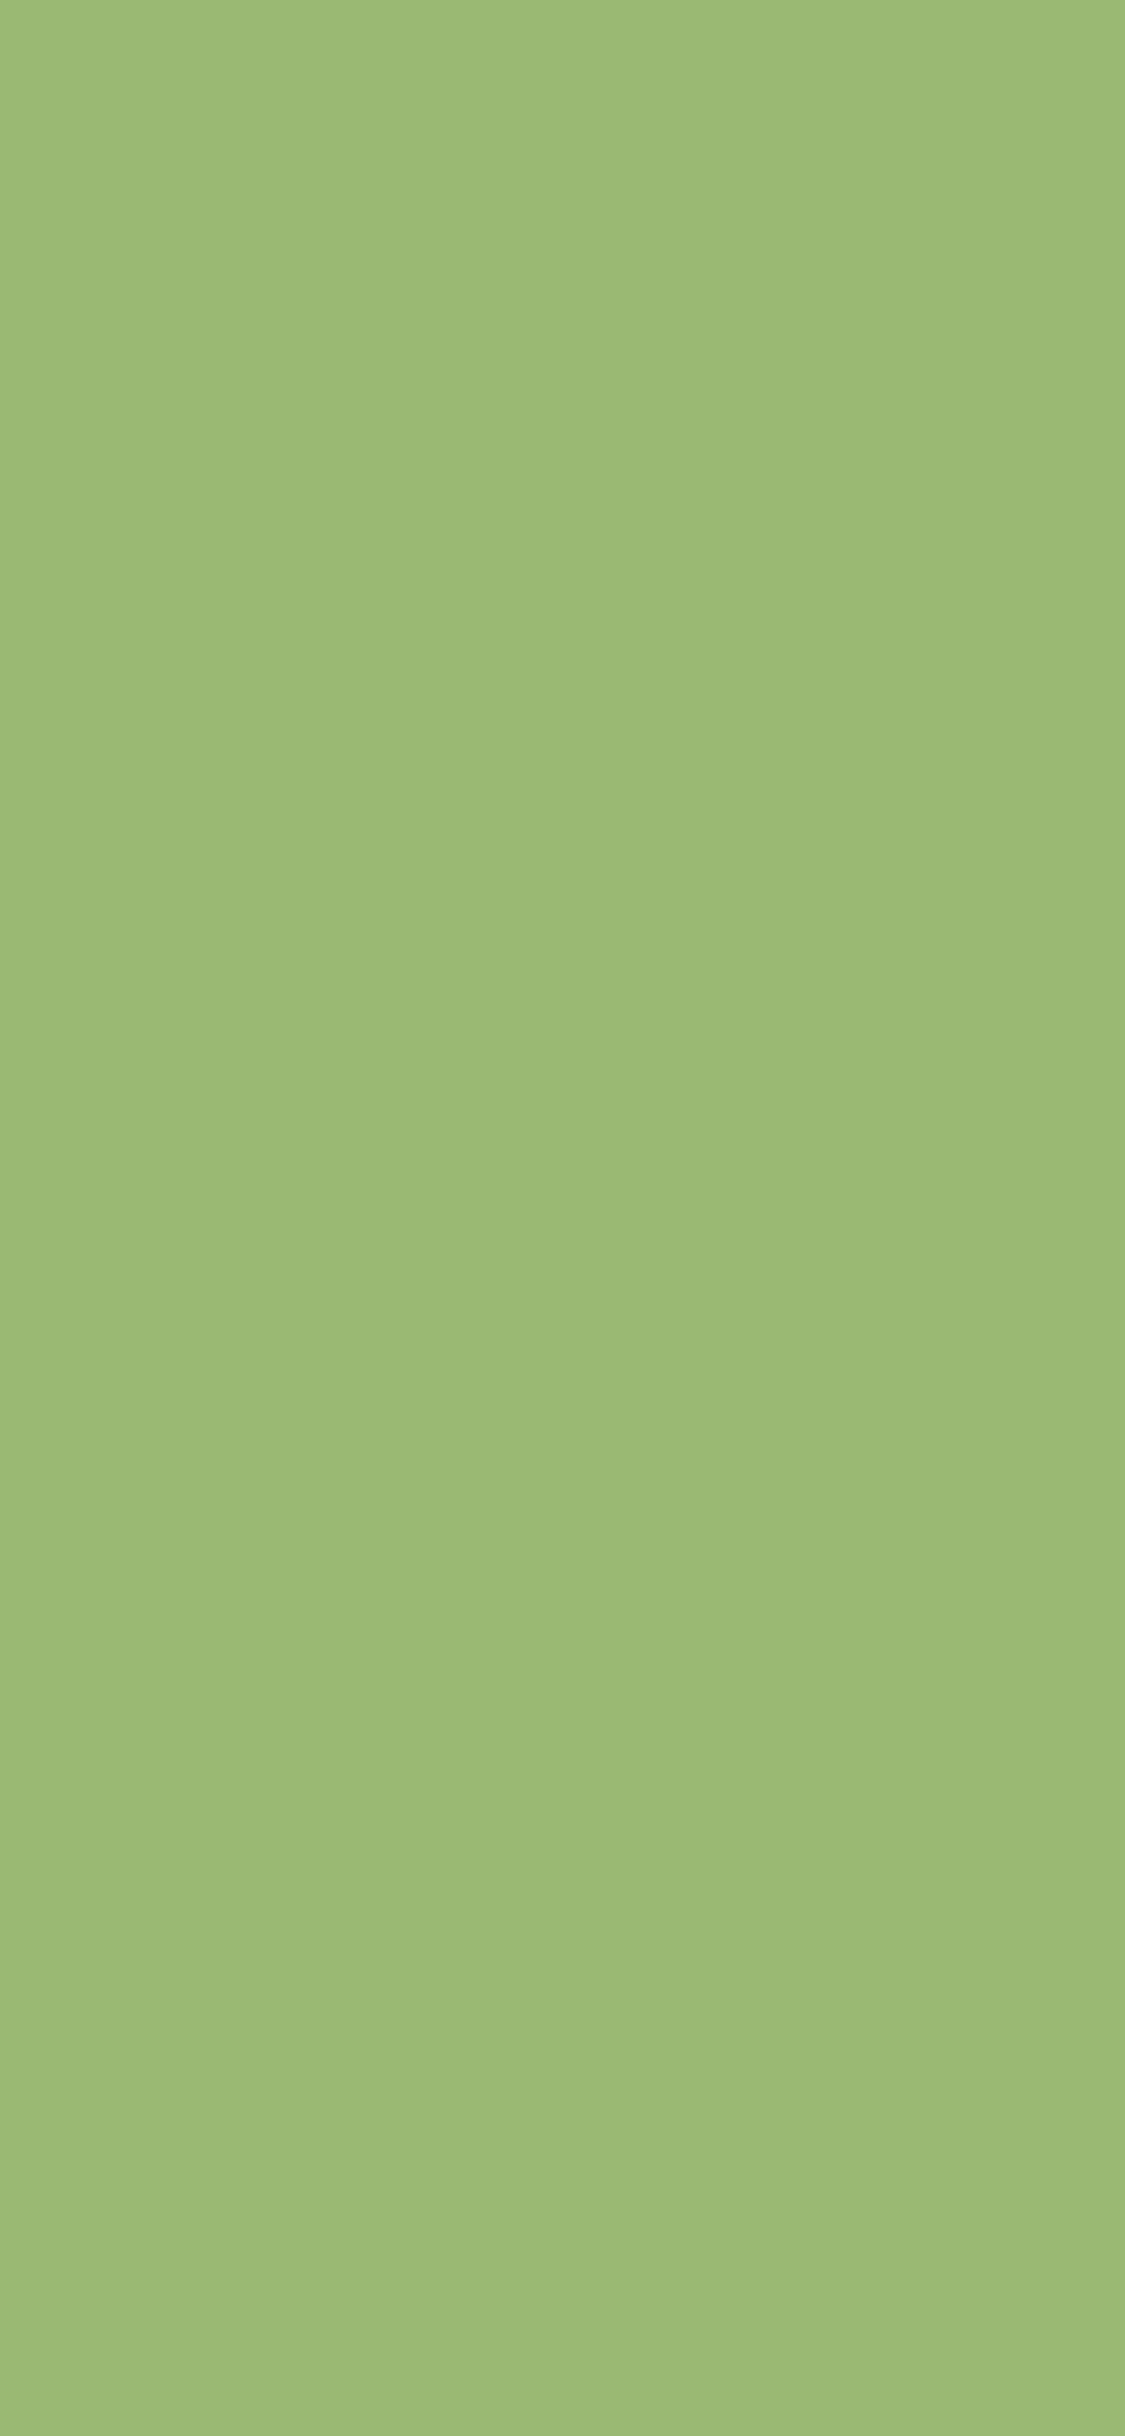 1125x2436 Olivine Solid Color Background